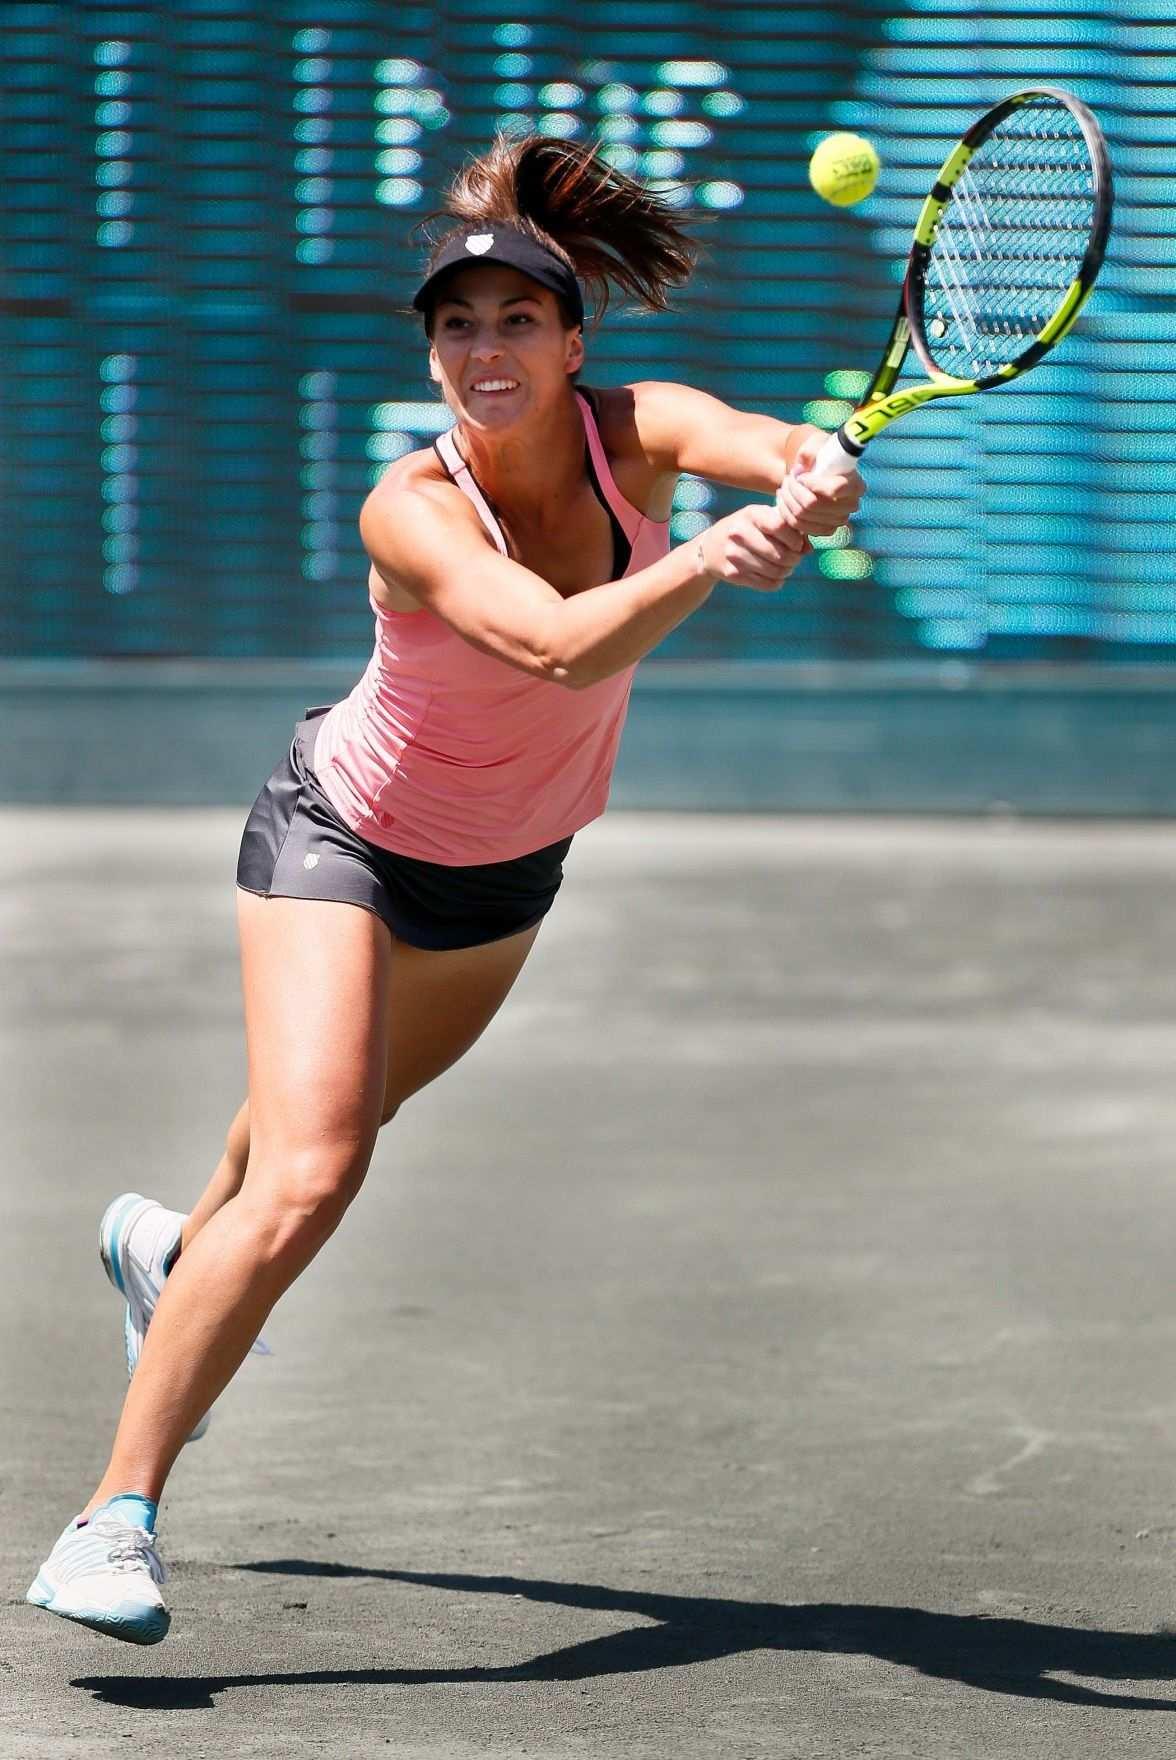 11 Concept of Volvo Tennis Charleston 2020 Release Date with Volvo Tennis Charleston 2020